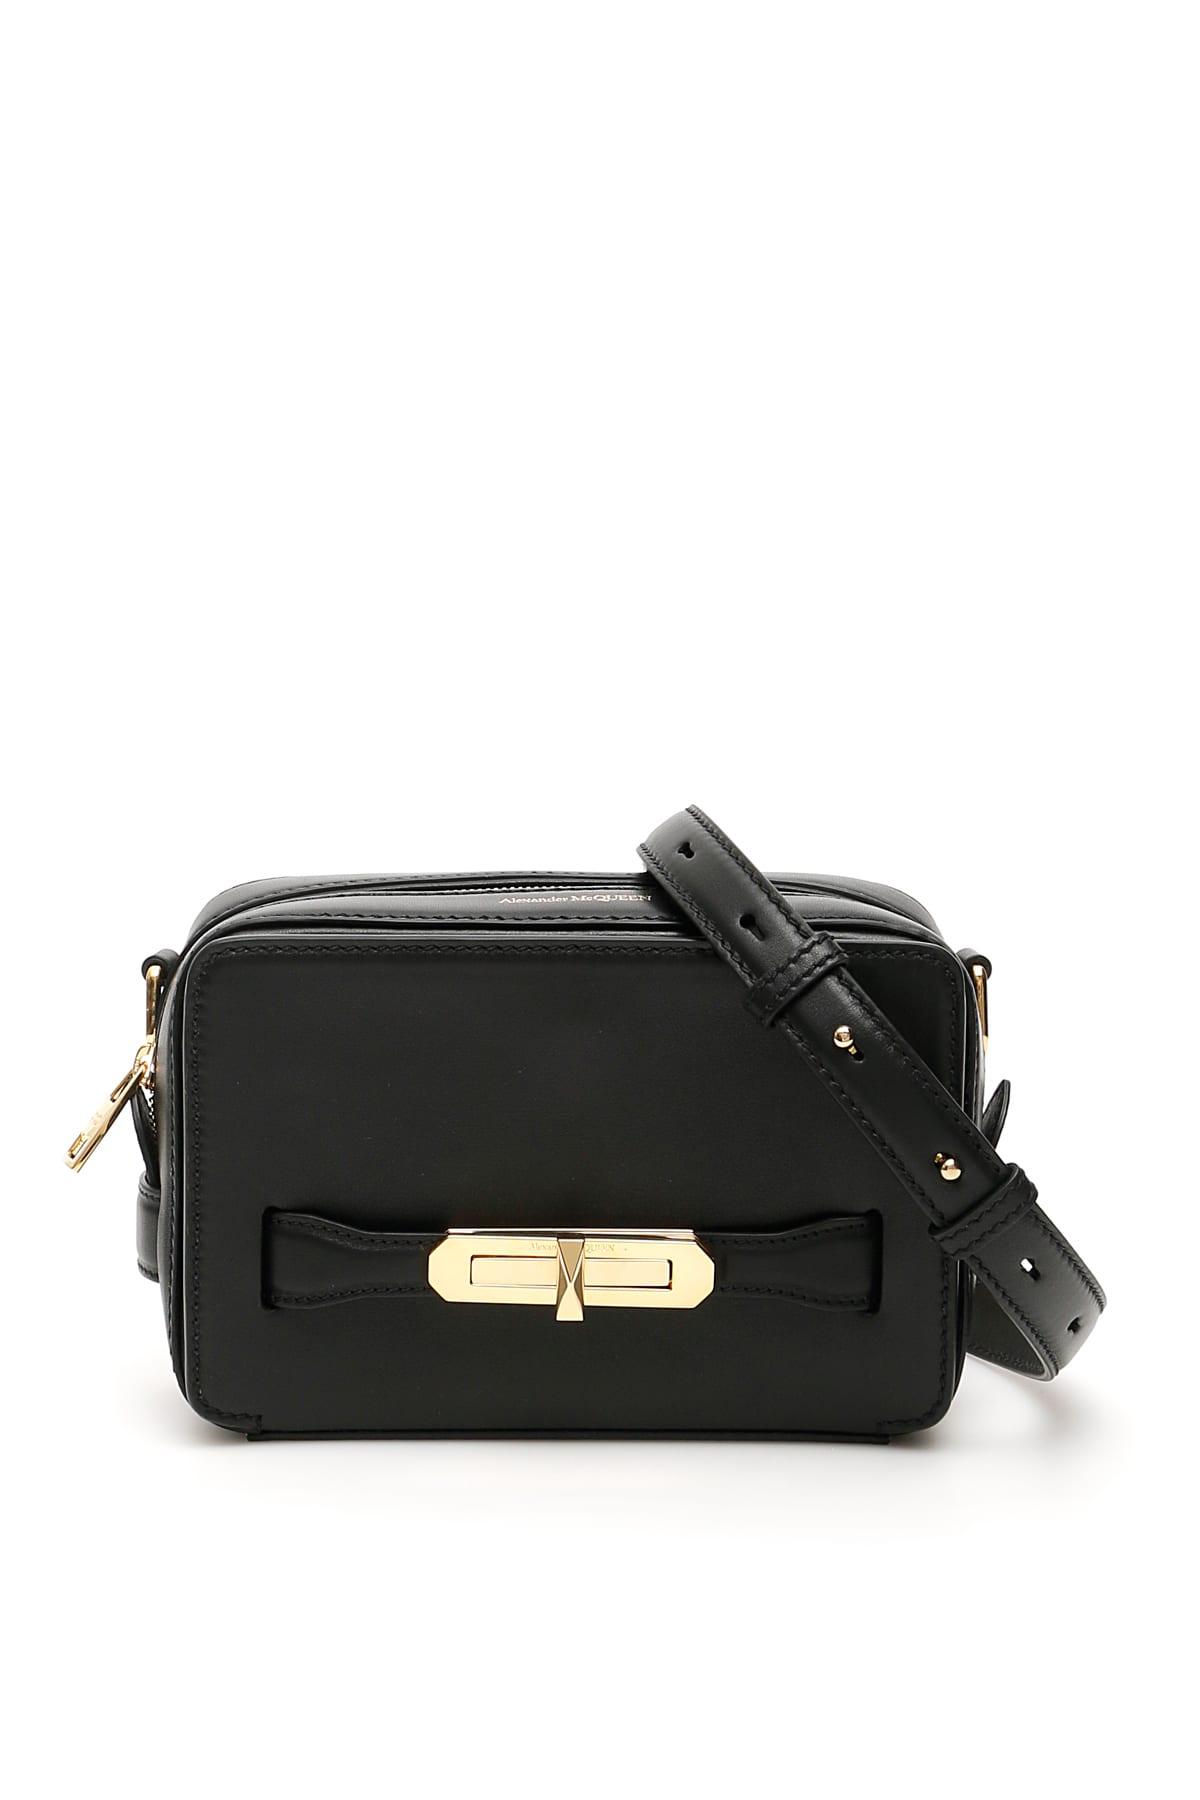 The Myth Small Bag